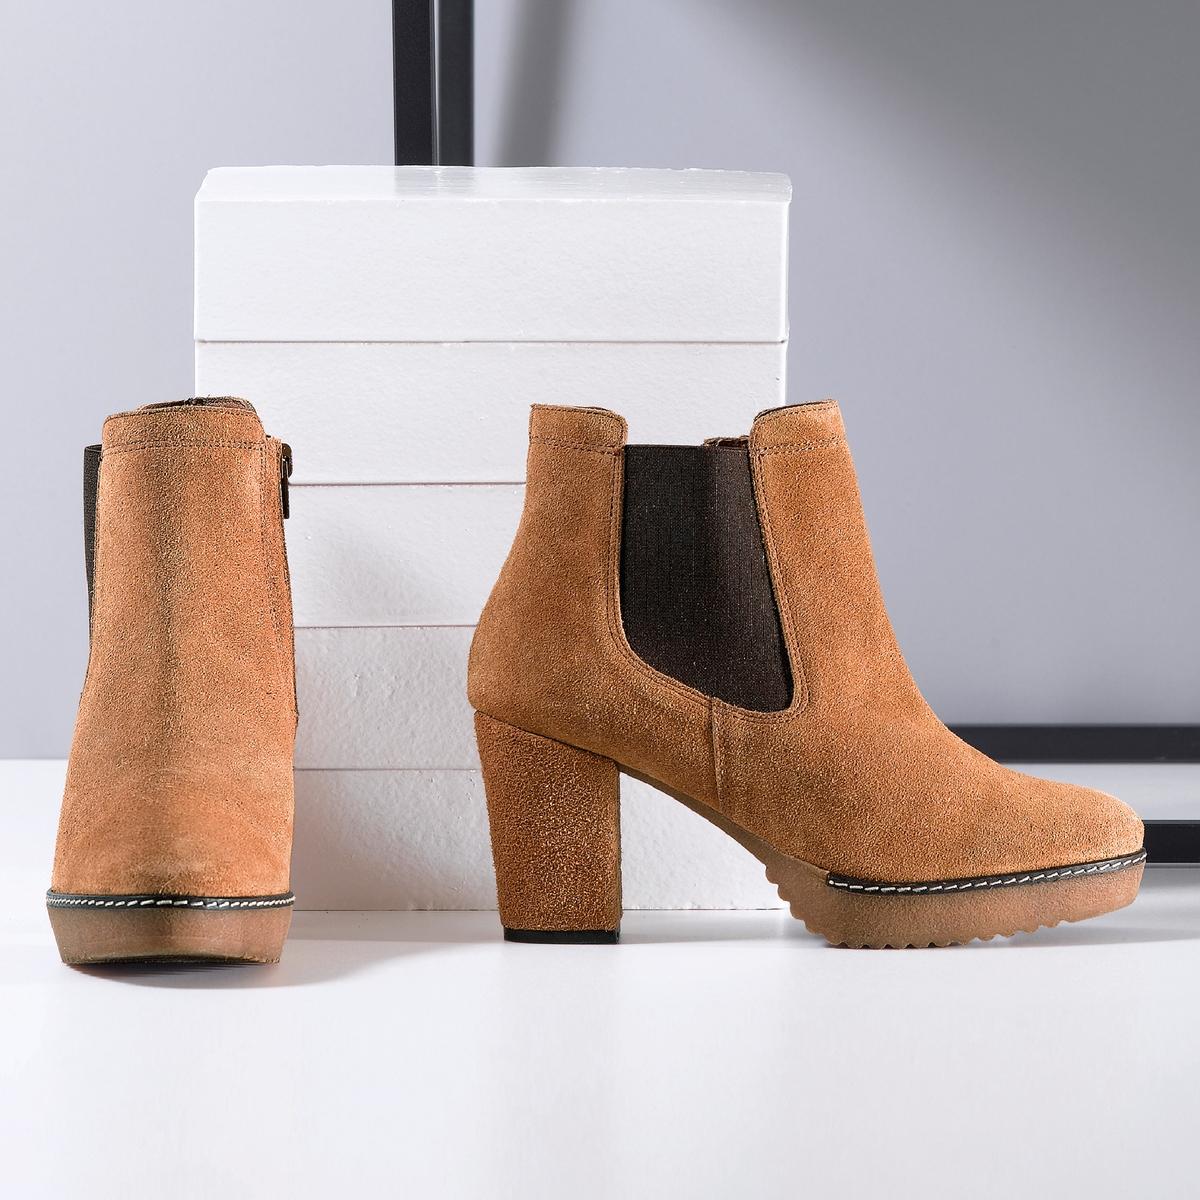 Ботильоны из спилка, размер 38-45 ботинки из спилка 26 40